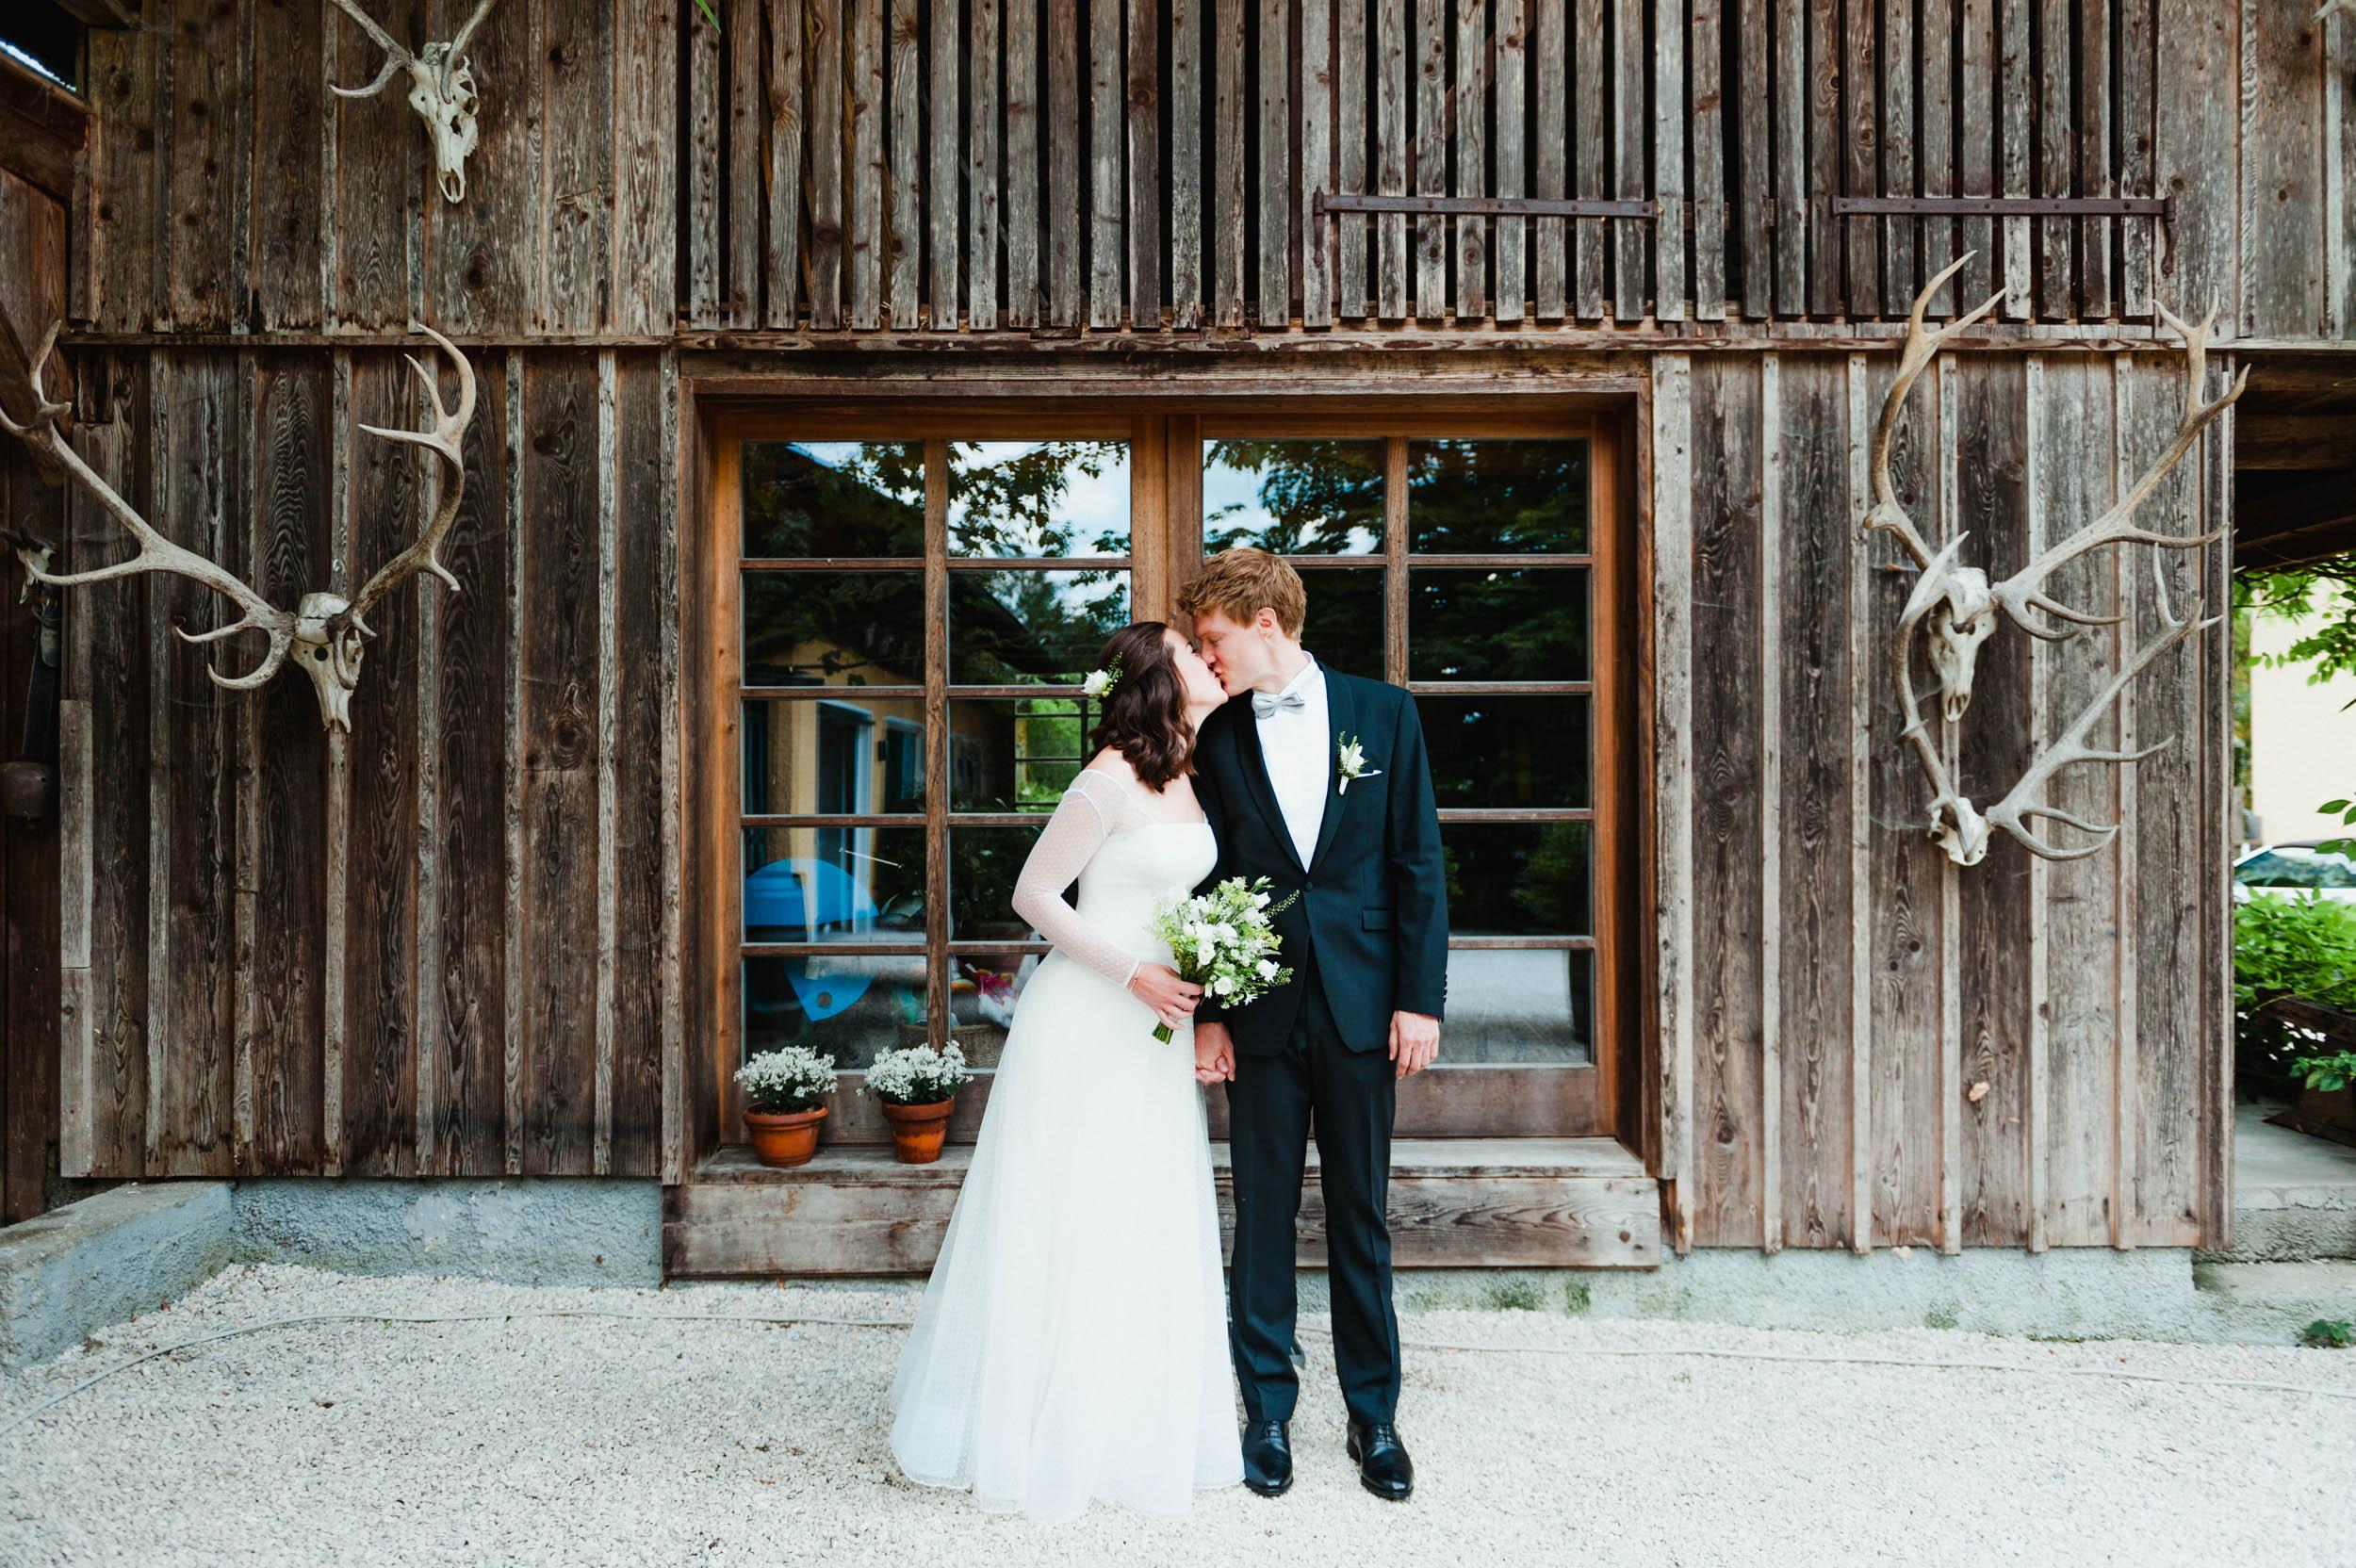 Attersee_Wedding-16.jpg